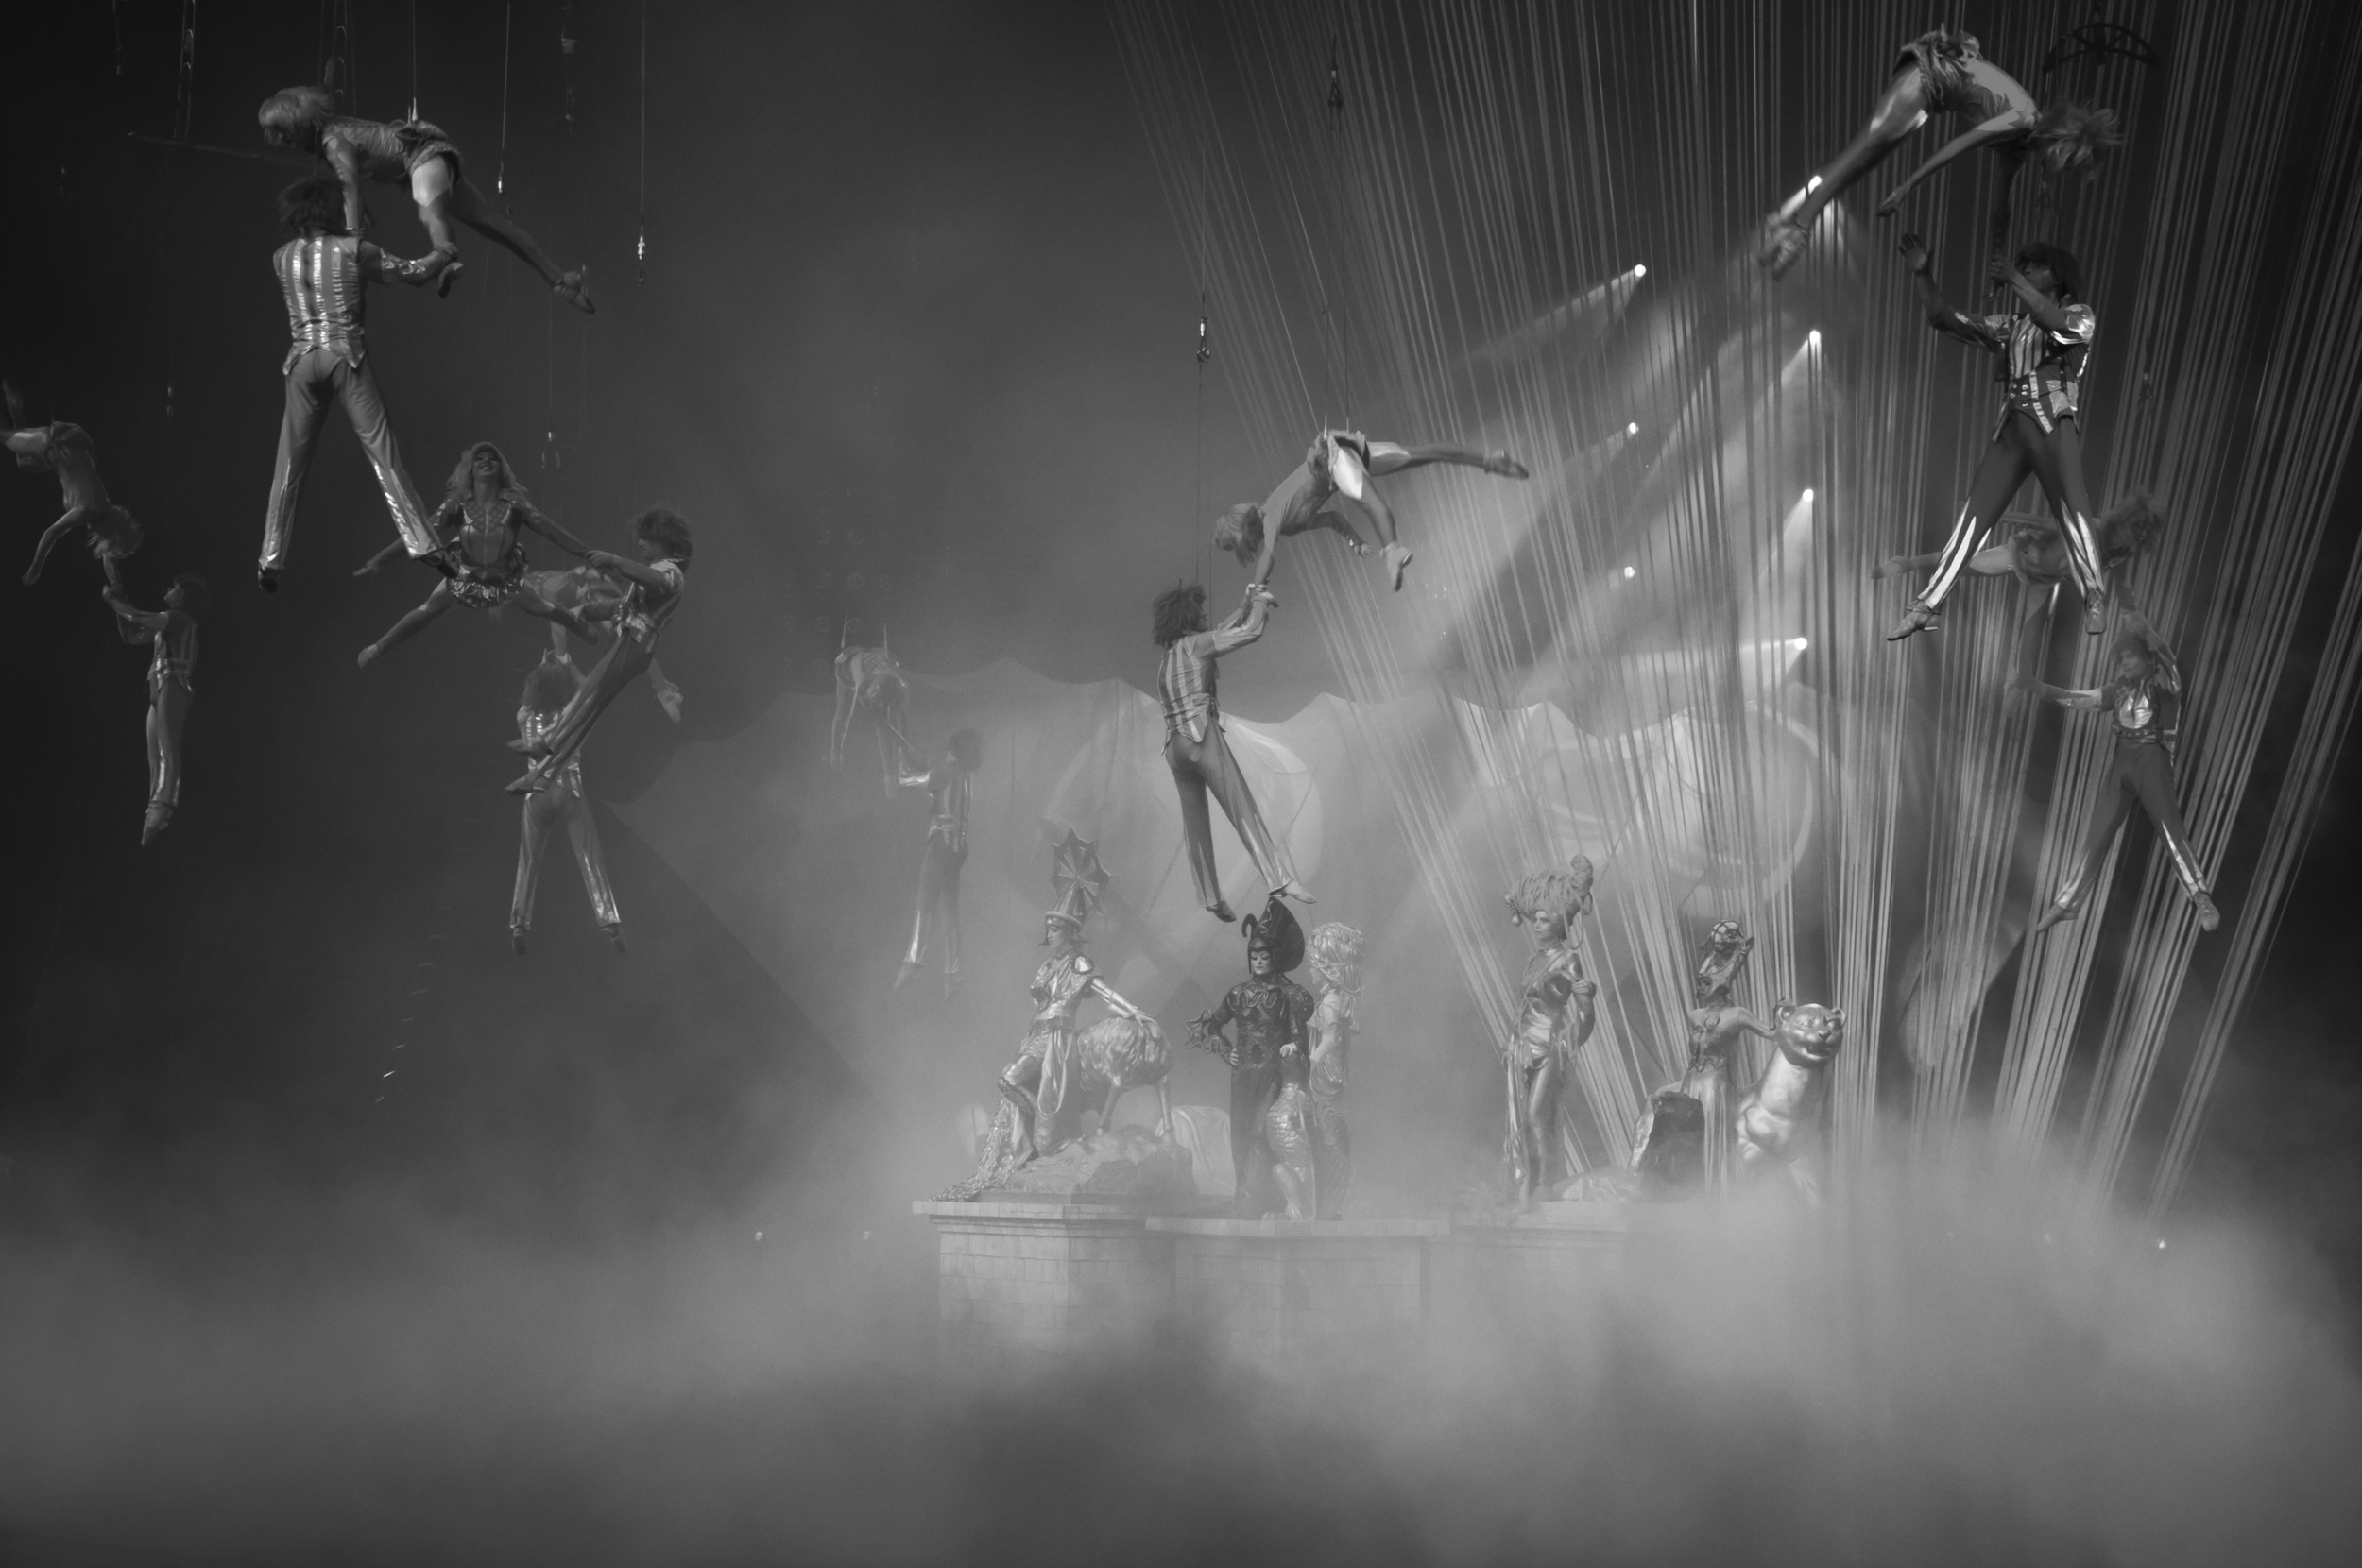 Spectacular acrobat show at Chimelong International Circus, Guangzhou